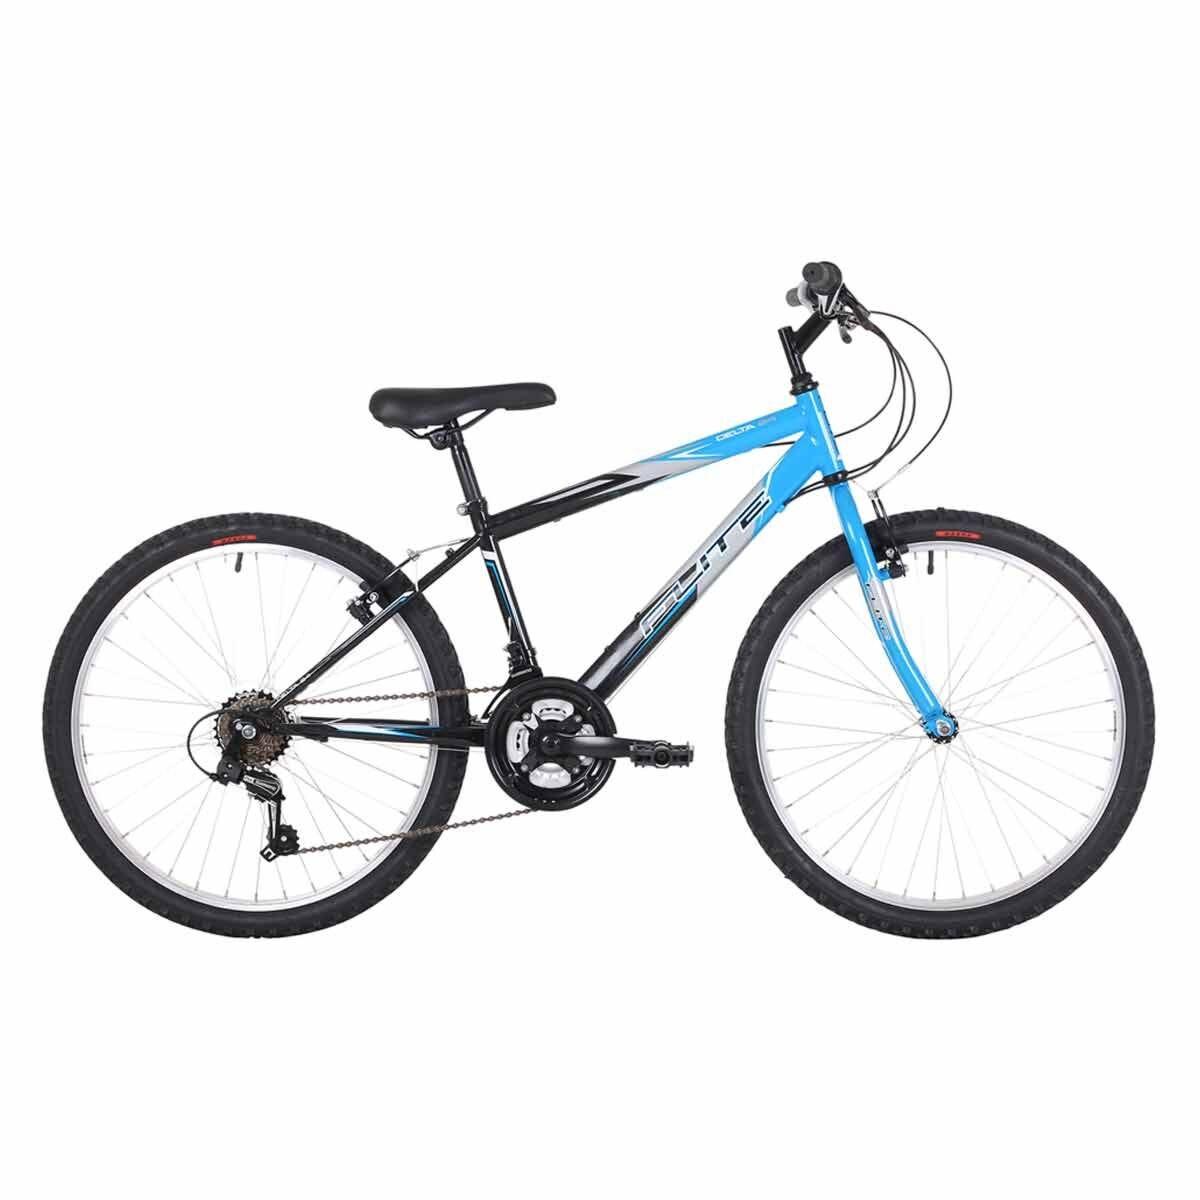 Flite Delta Kids Mountain Bike 24 Inch Wheel Blue